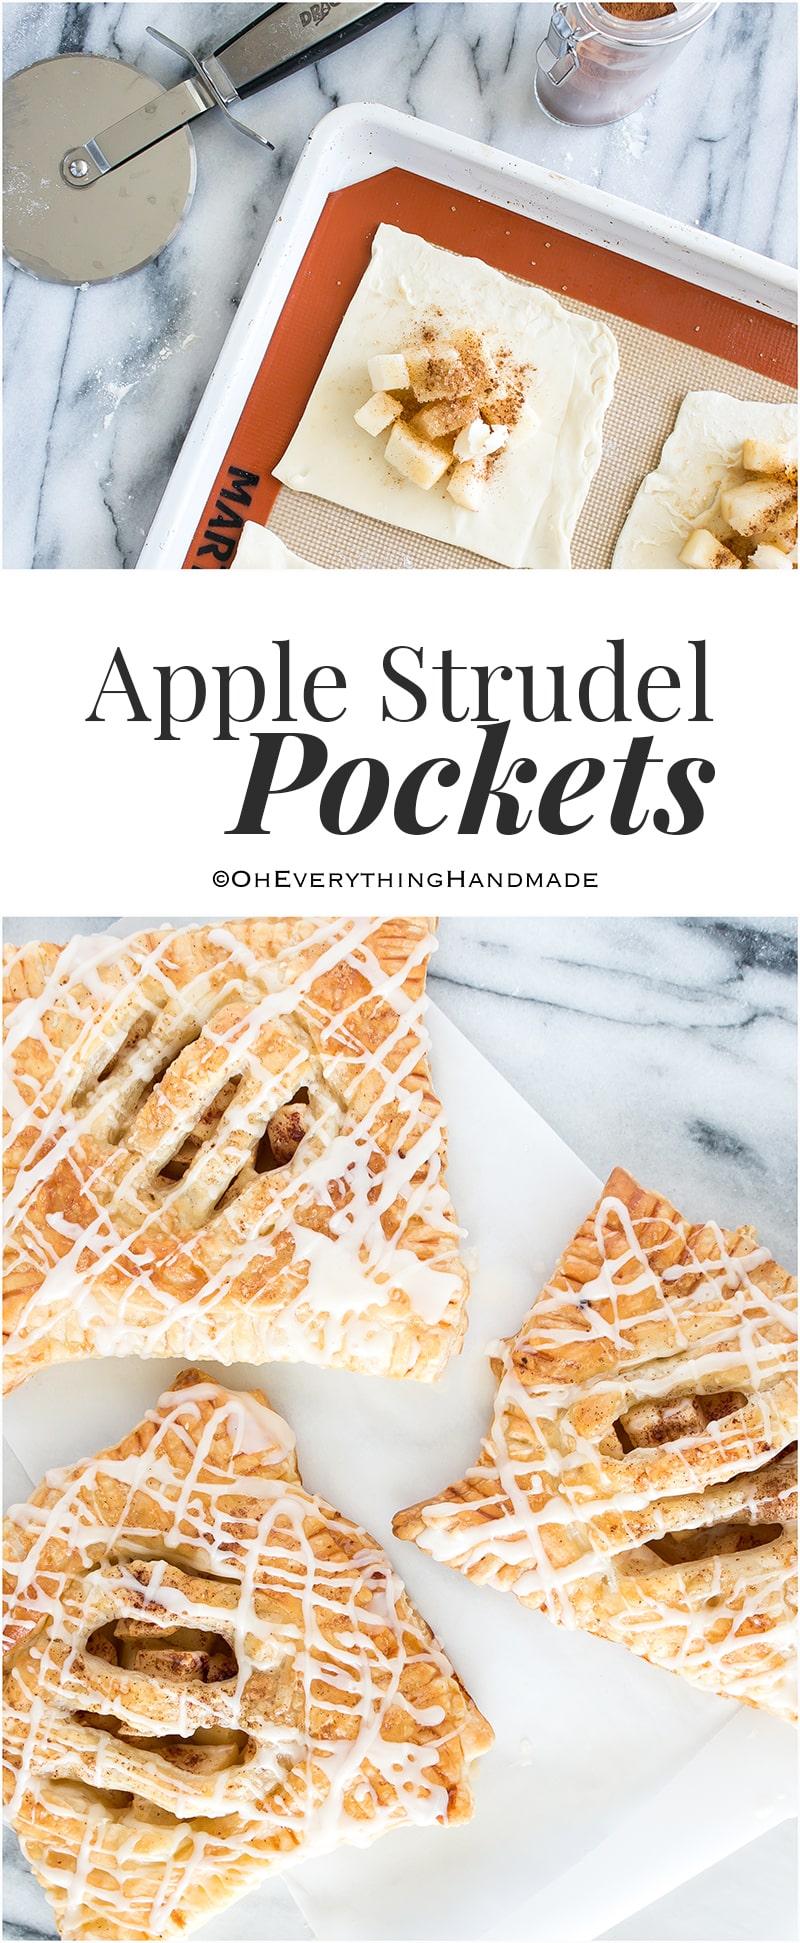 Apple Strudel Pockets - PinIt - Recipe